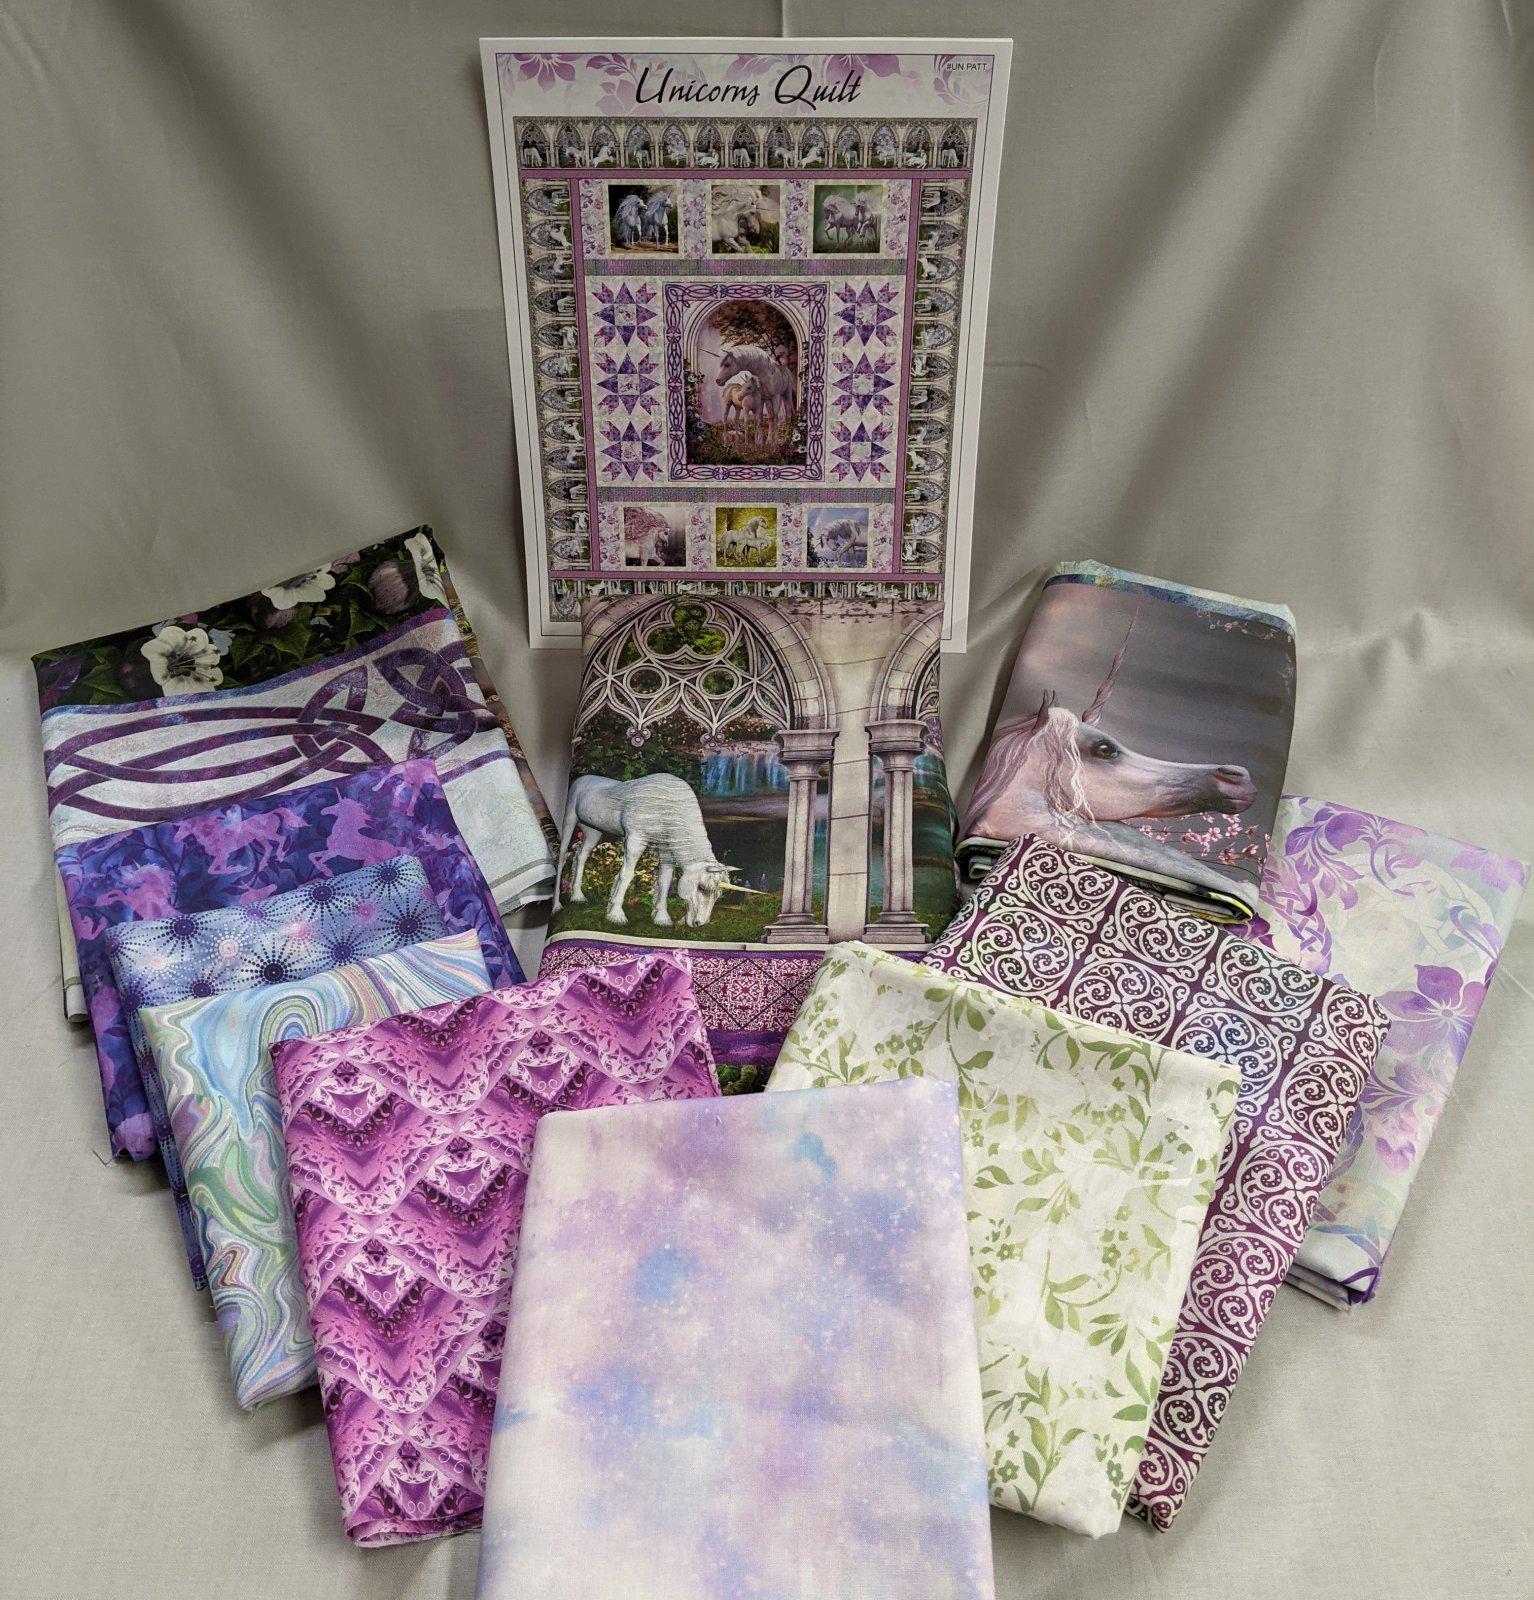 Unicorn Quilt Kit - ITB